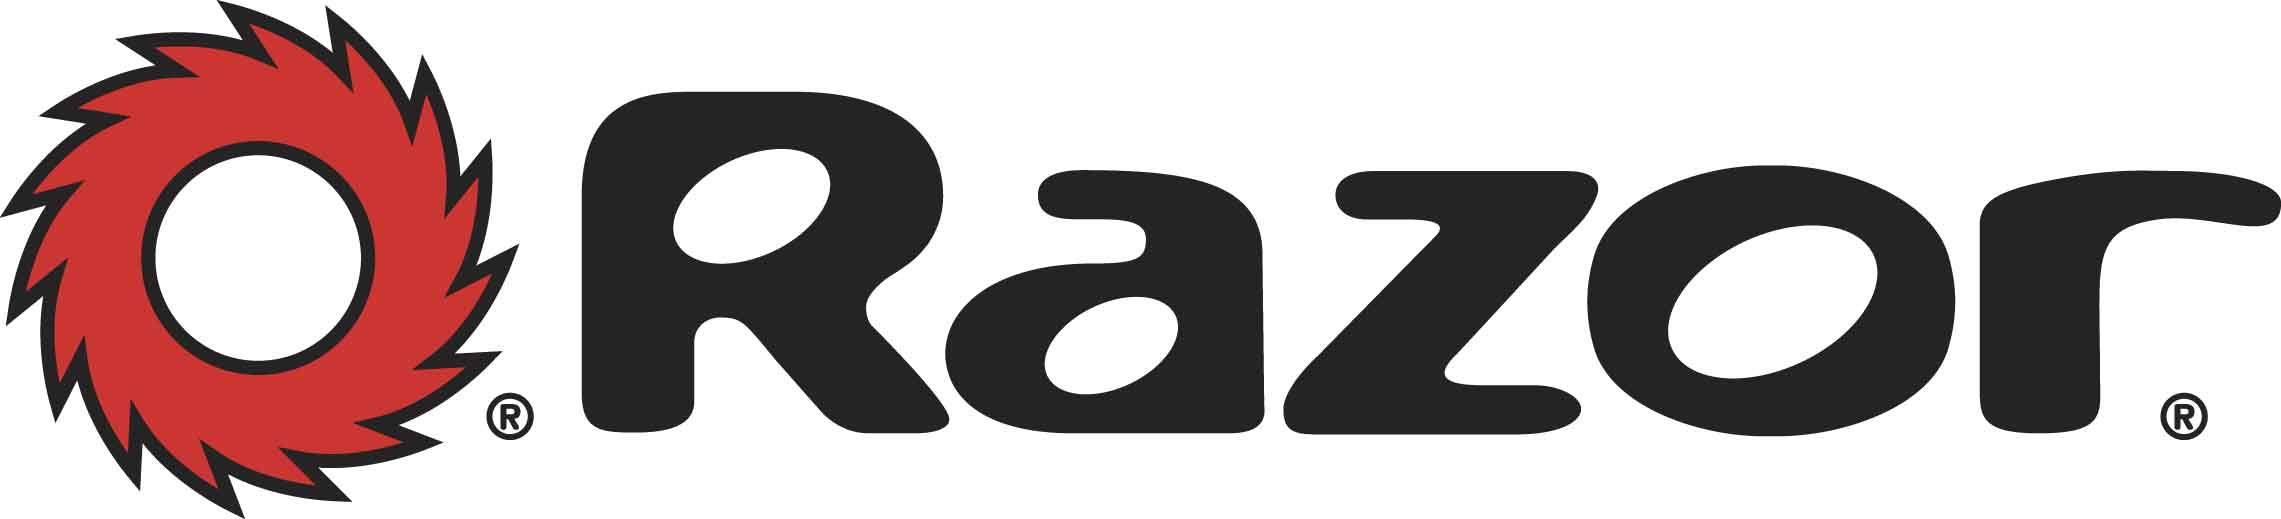 Fabricaciop: Razor Scooters Logo